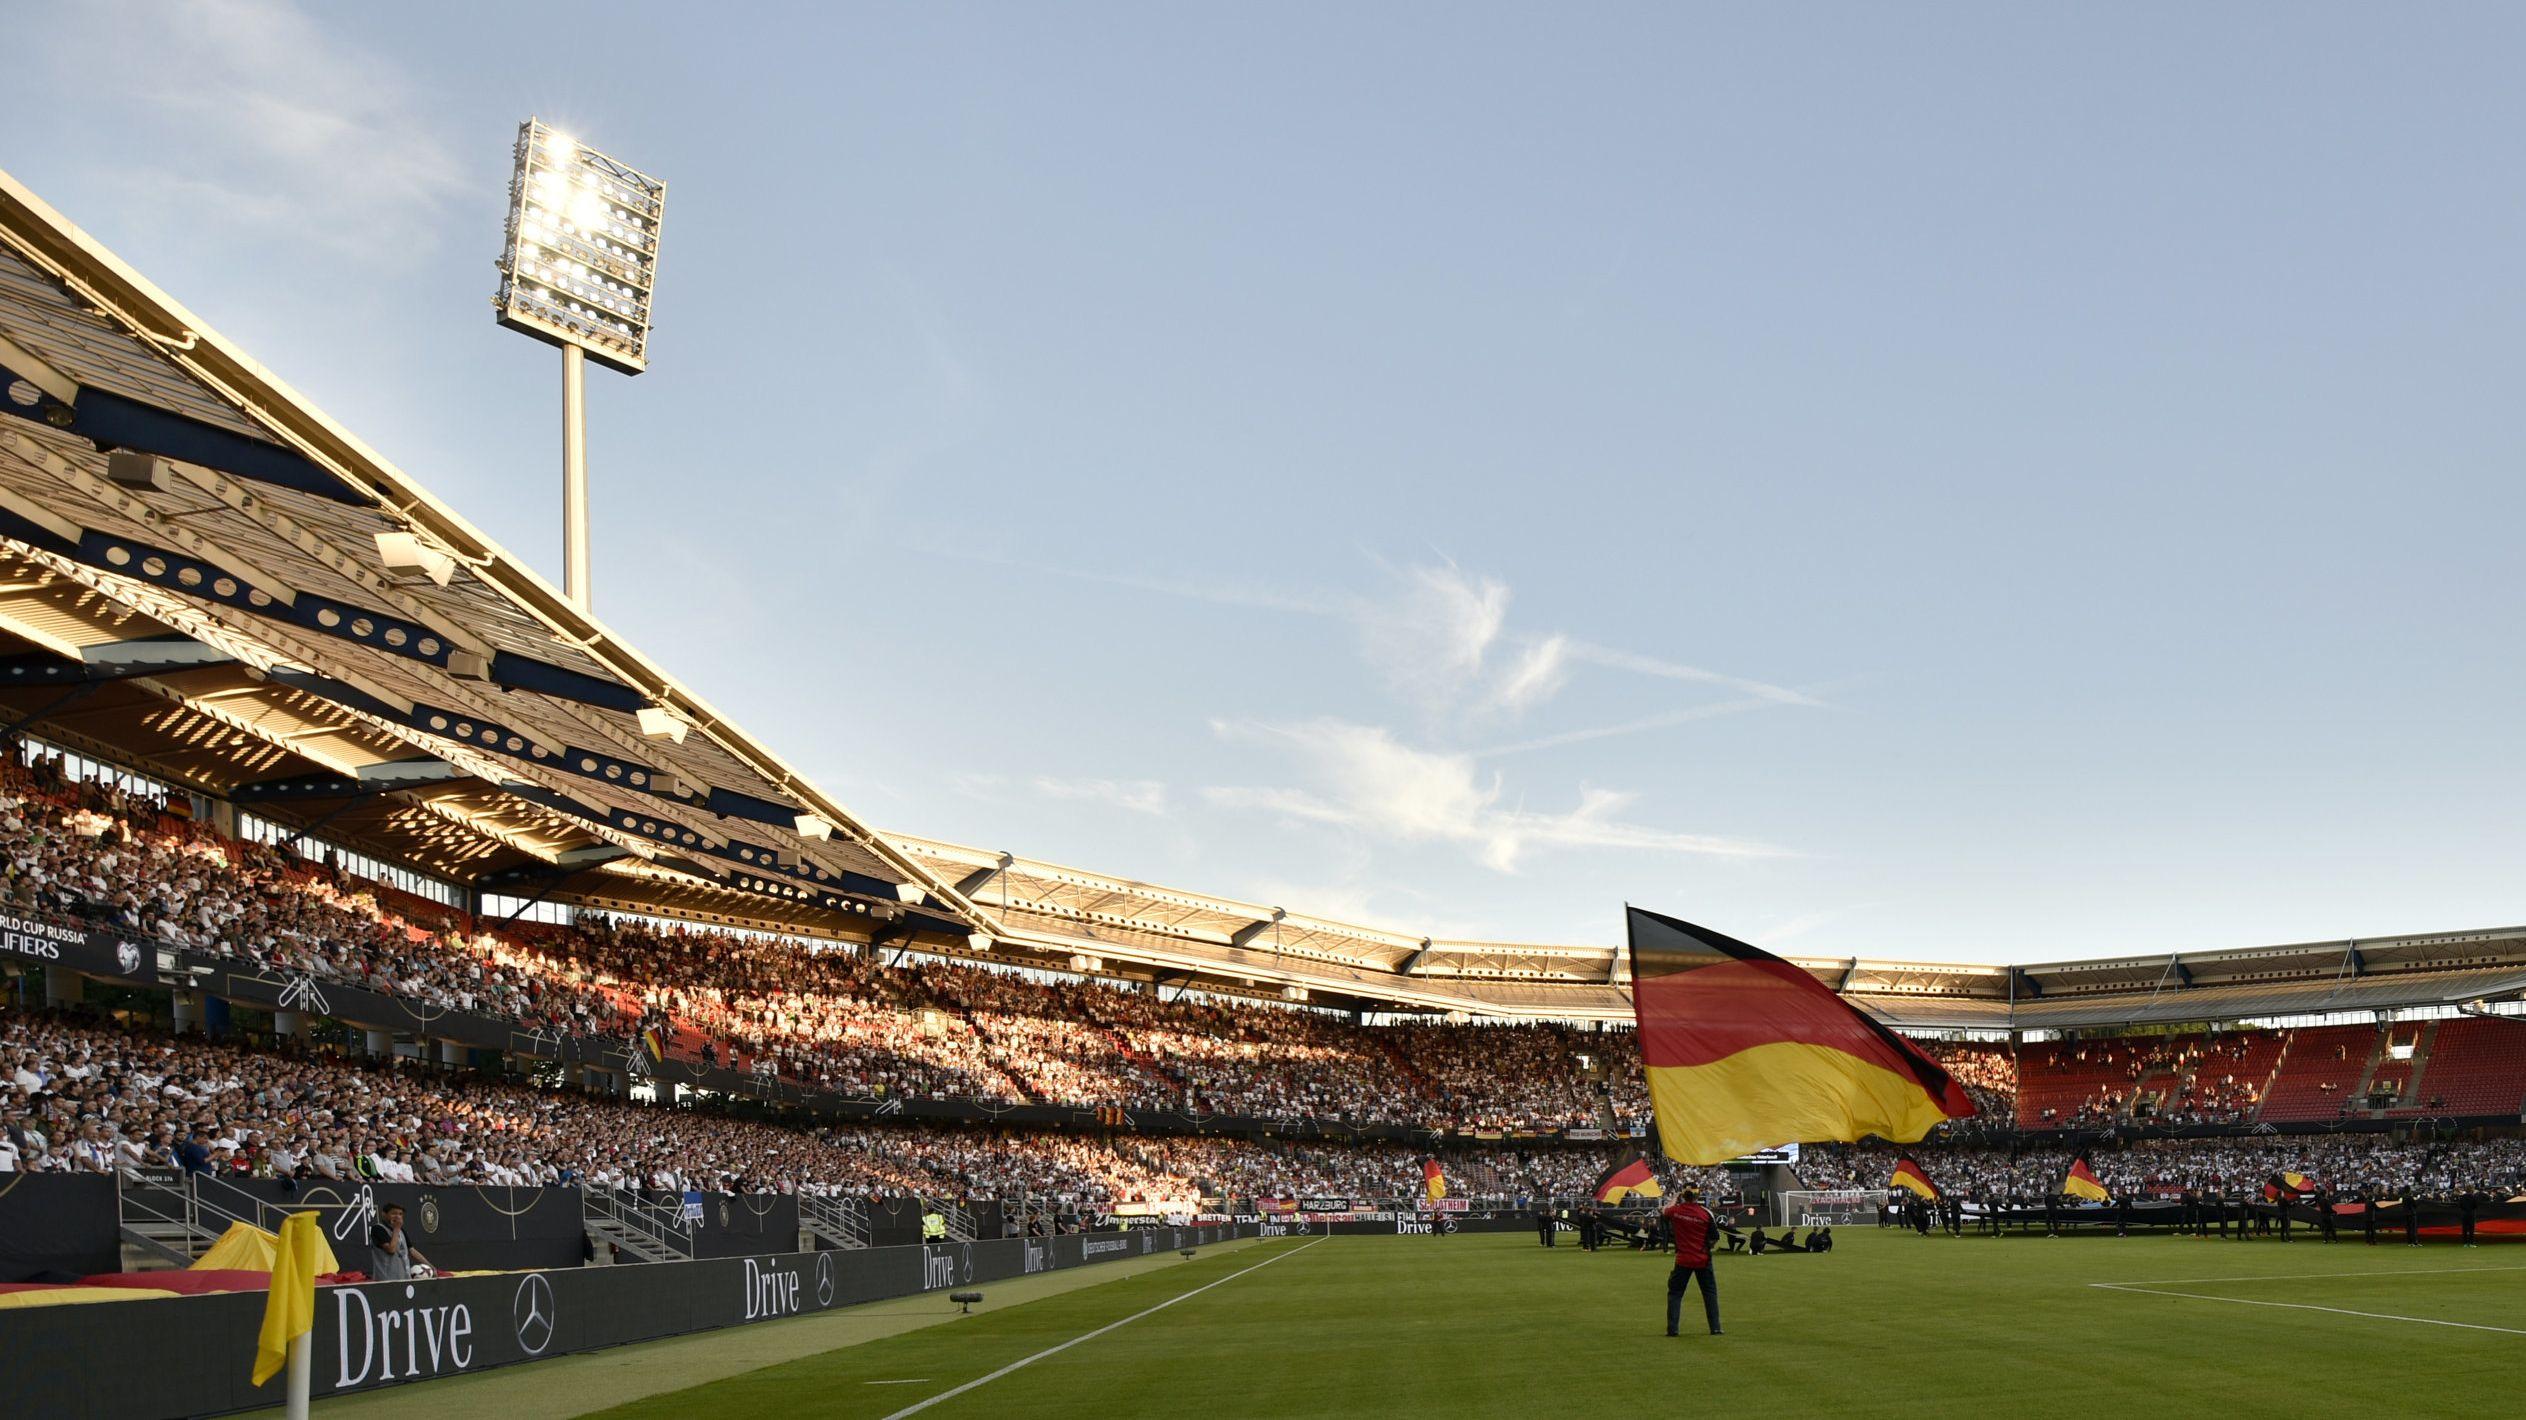 Länderspiel im Nürnberger Max-Morlock-Stadion